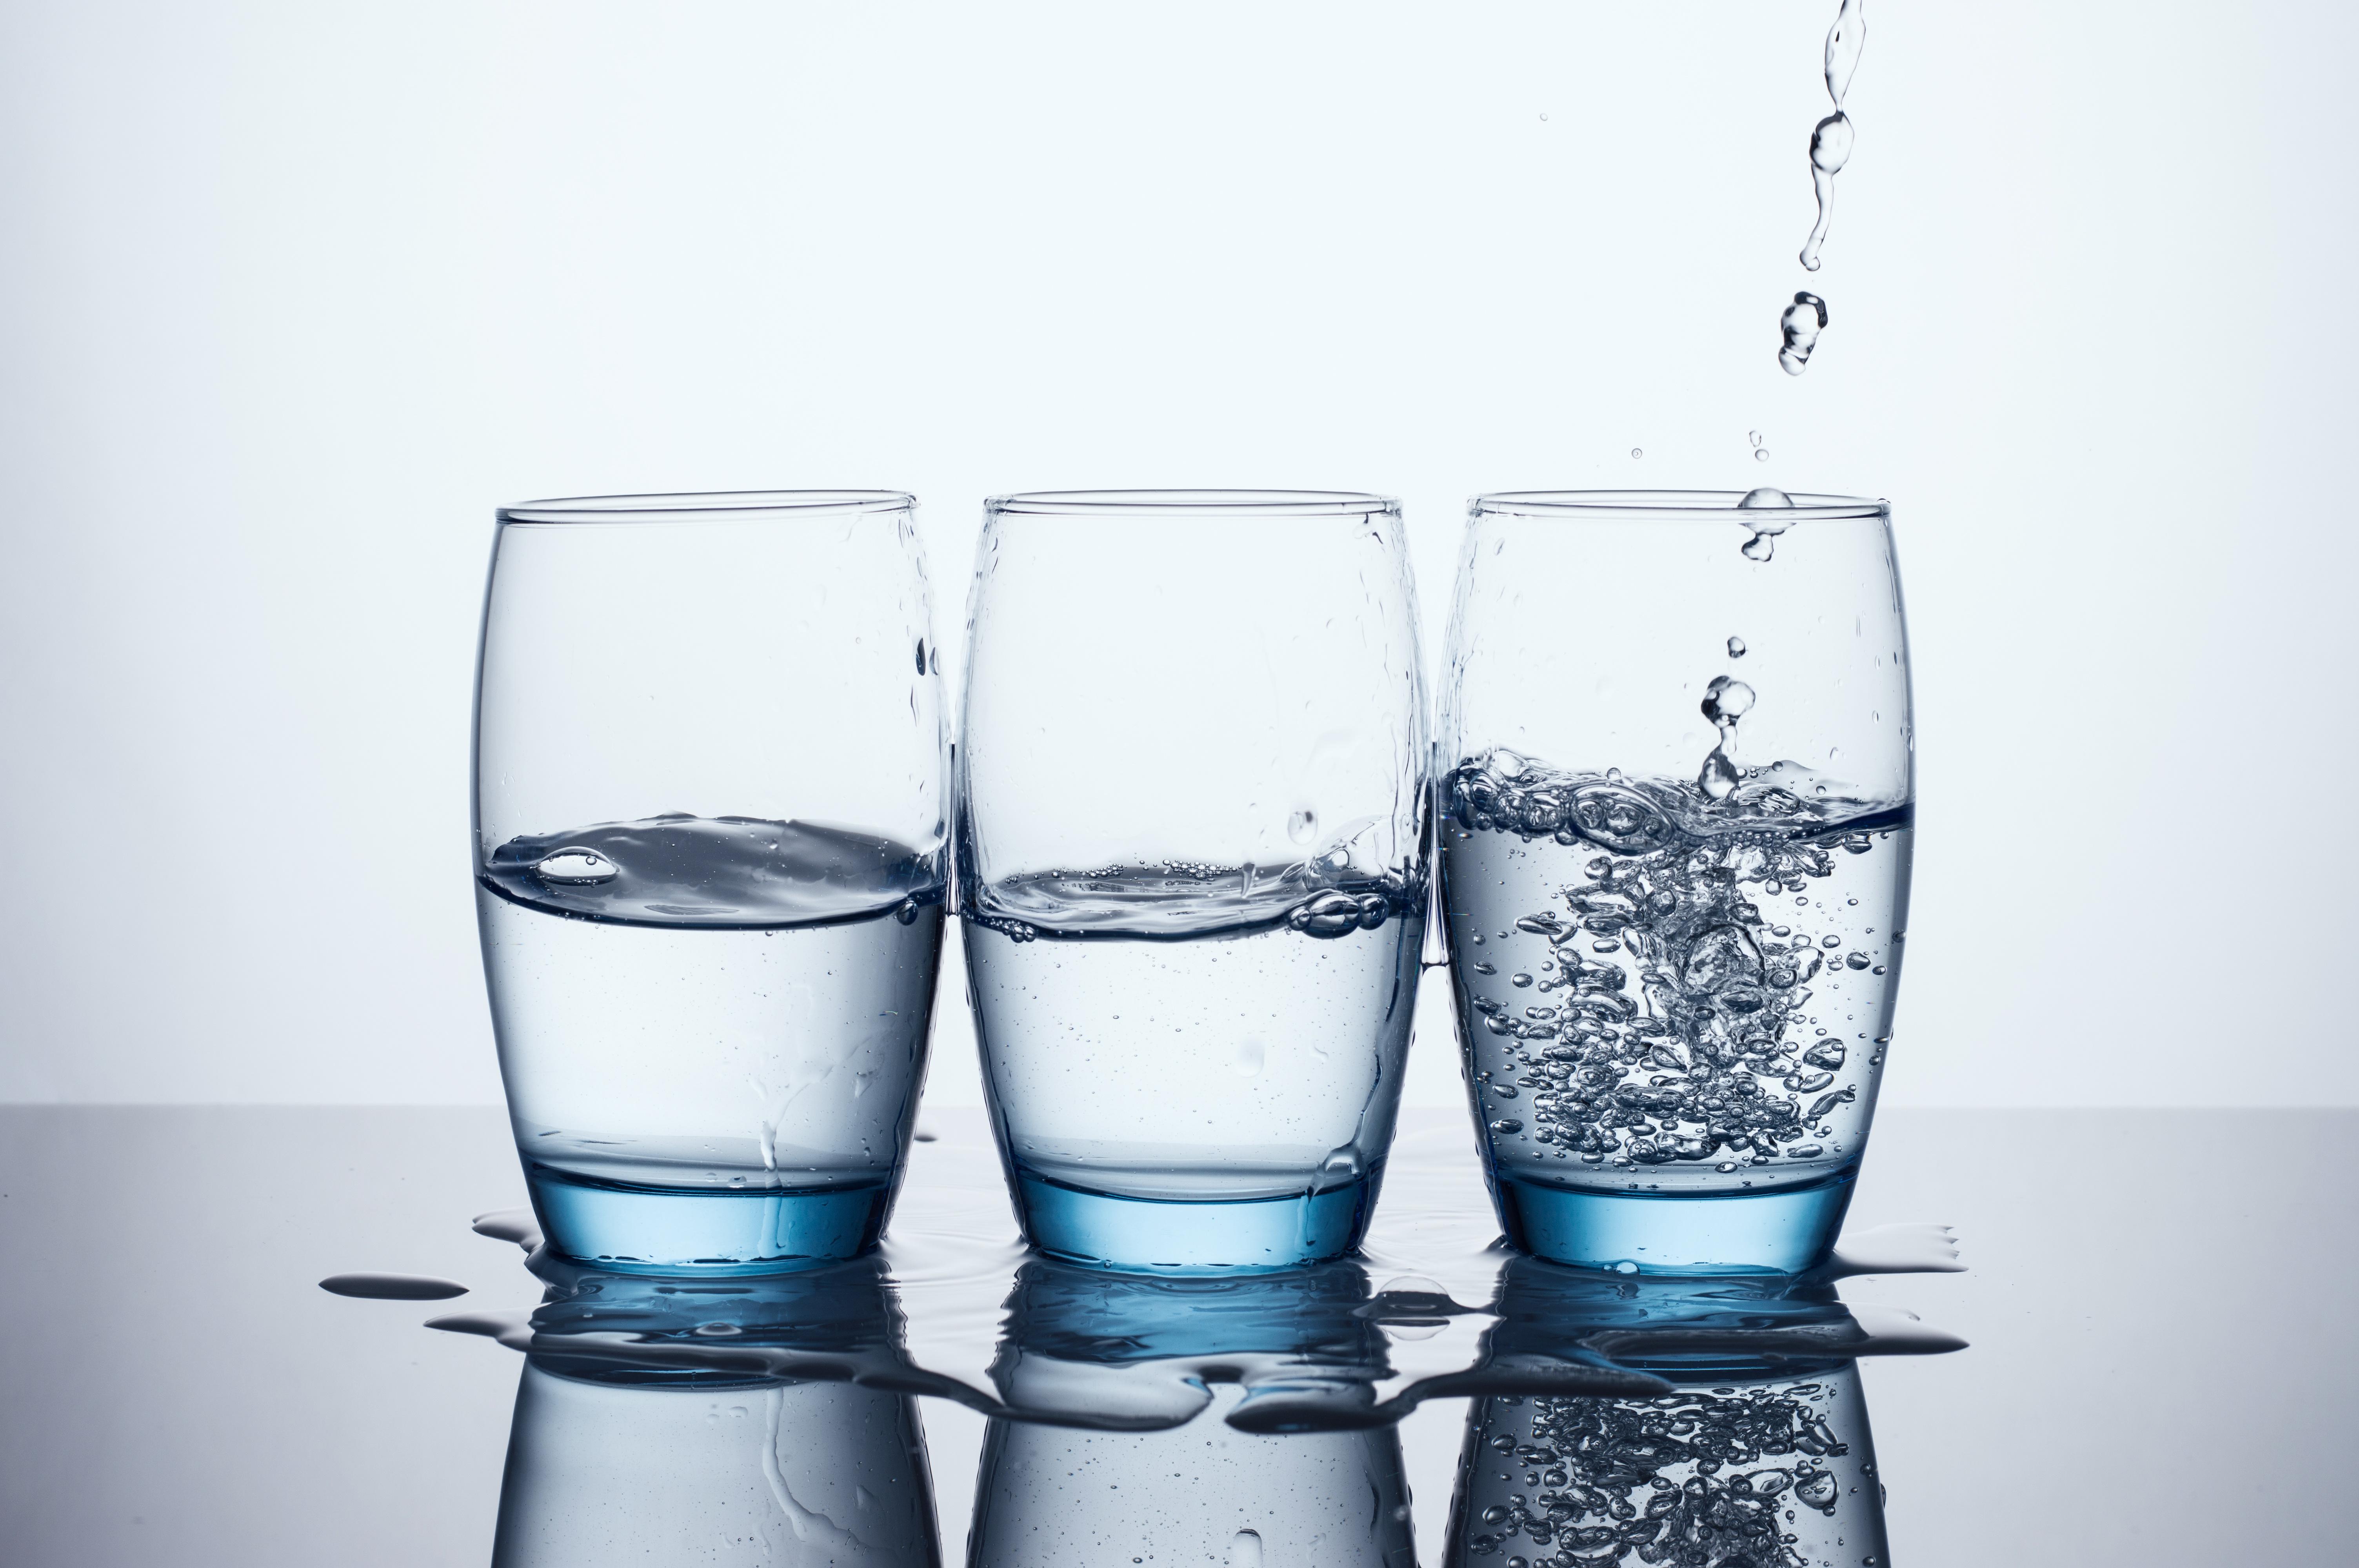 hj aeschbacher ag_Slider Trinkwasser